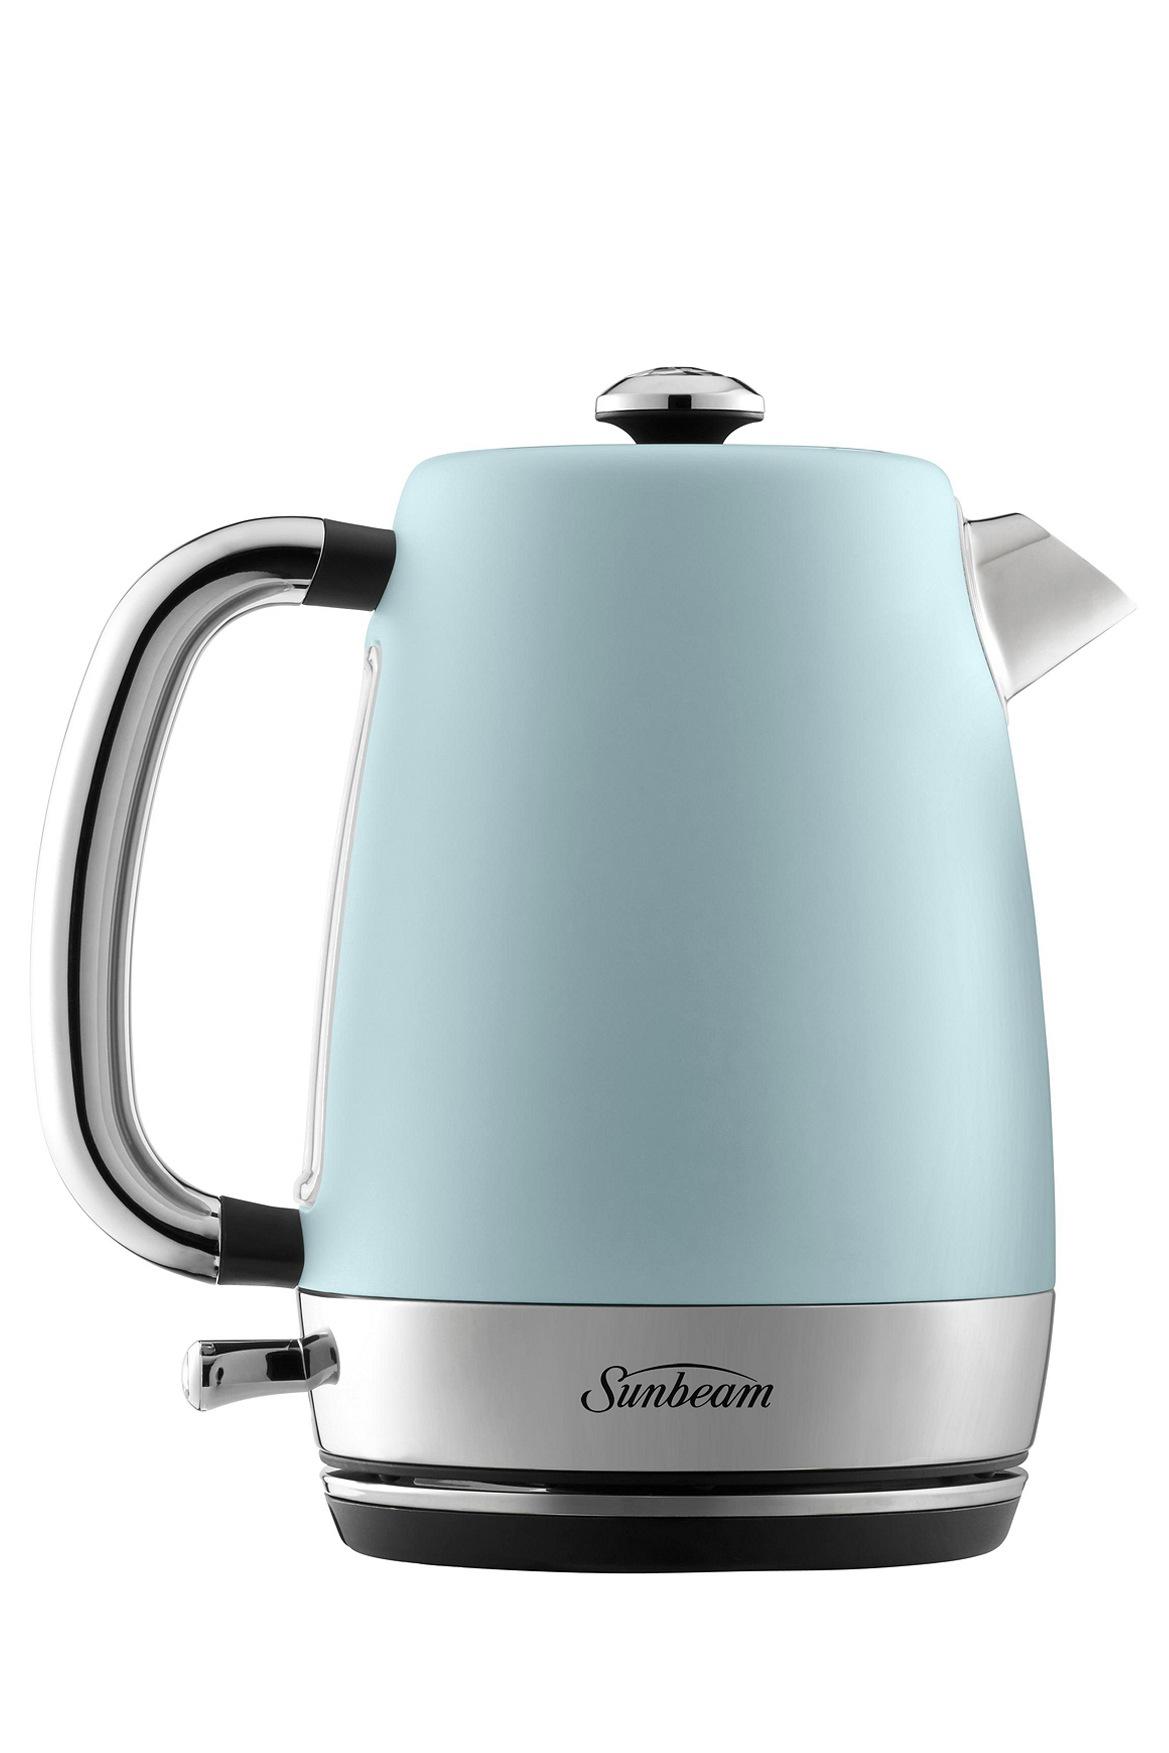 Sunbeam | KE2210B London Collection Conventional kettle: Blue | Myer ...